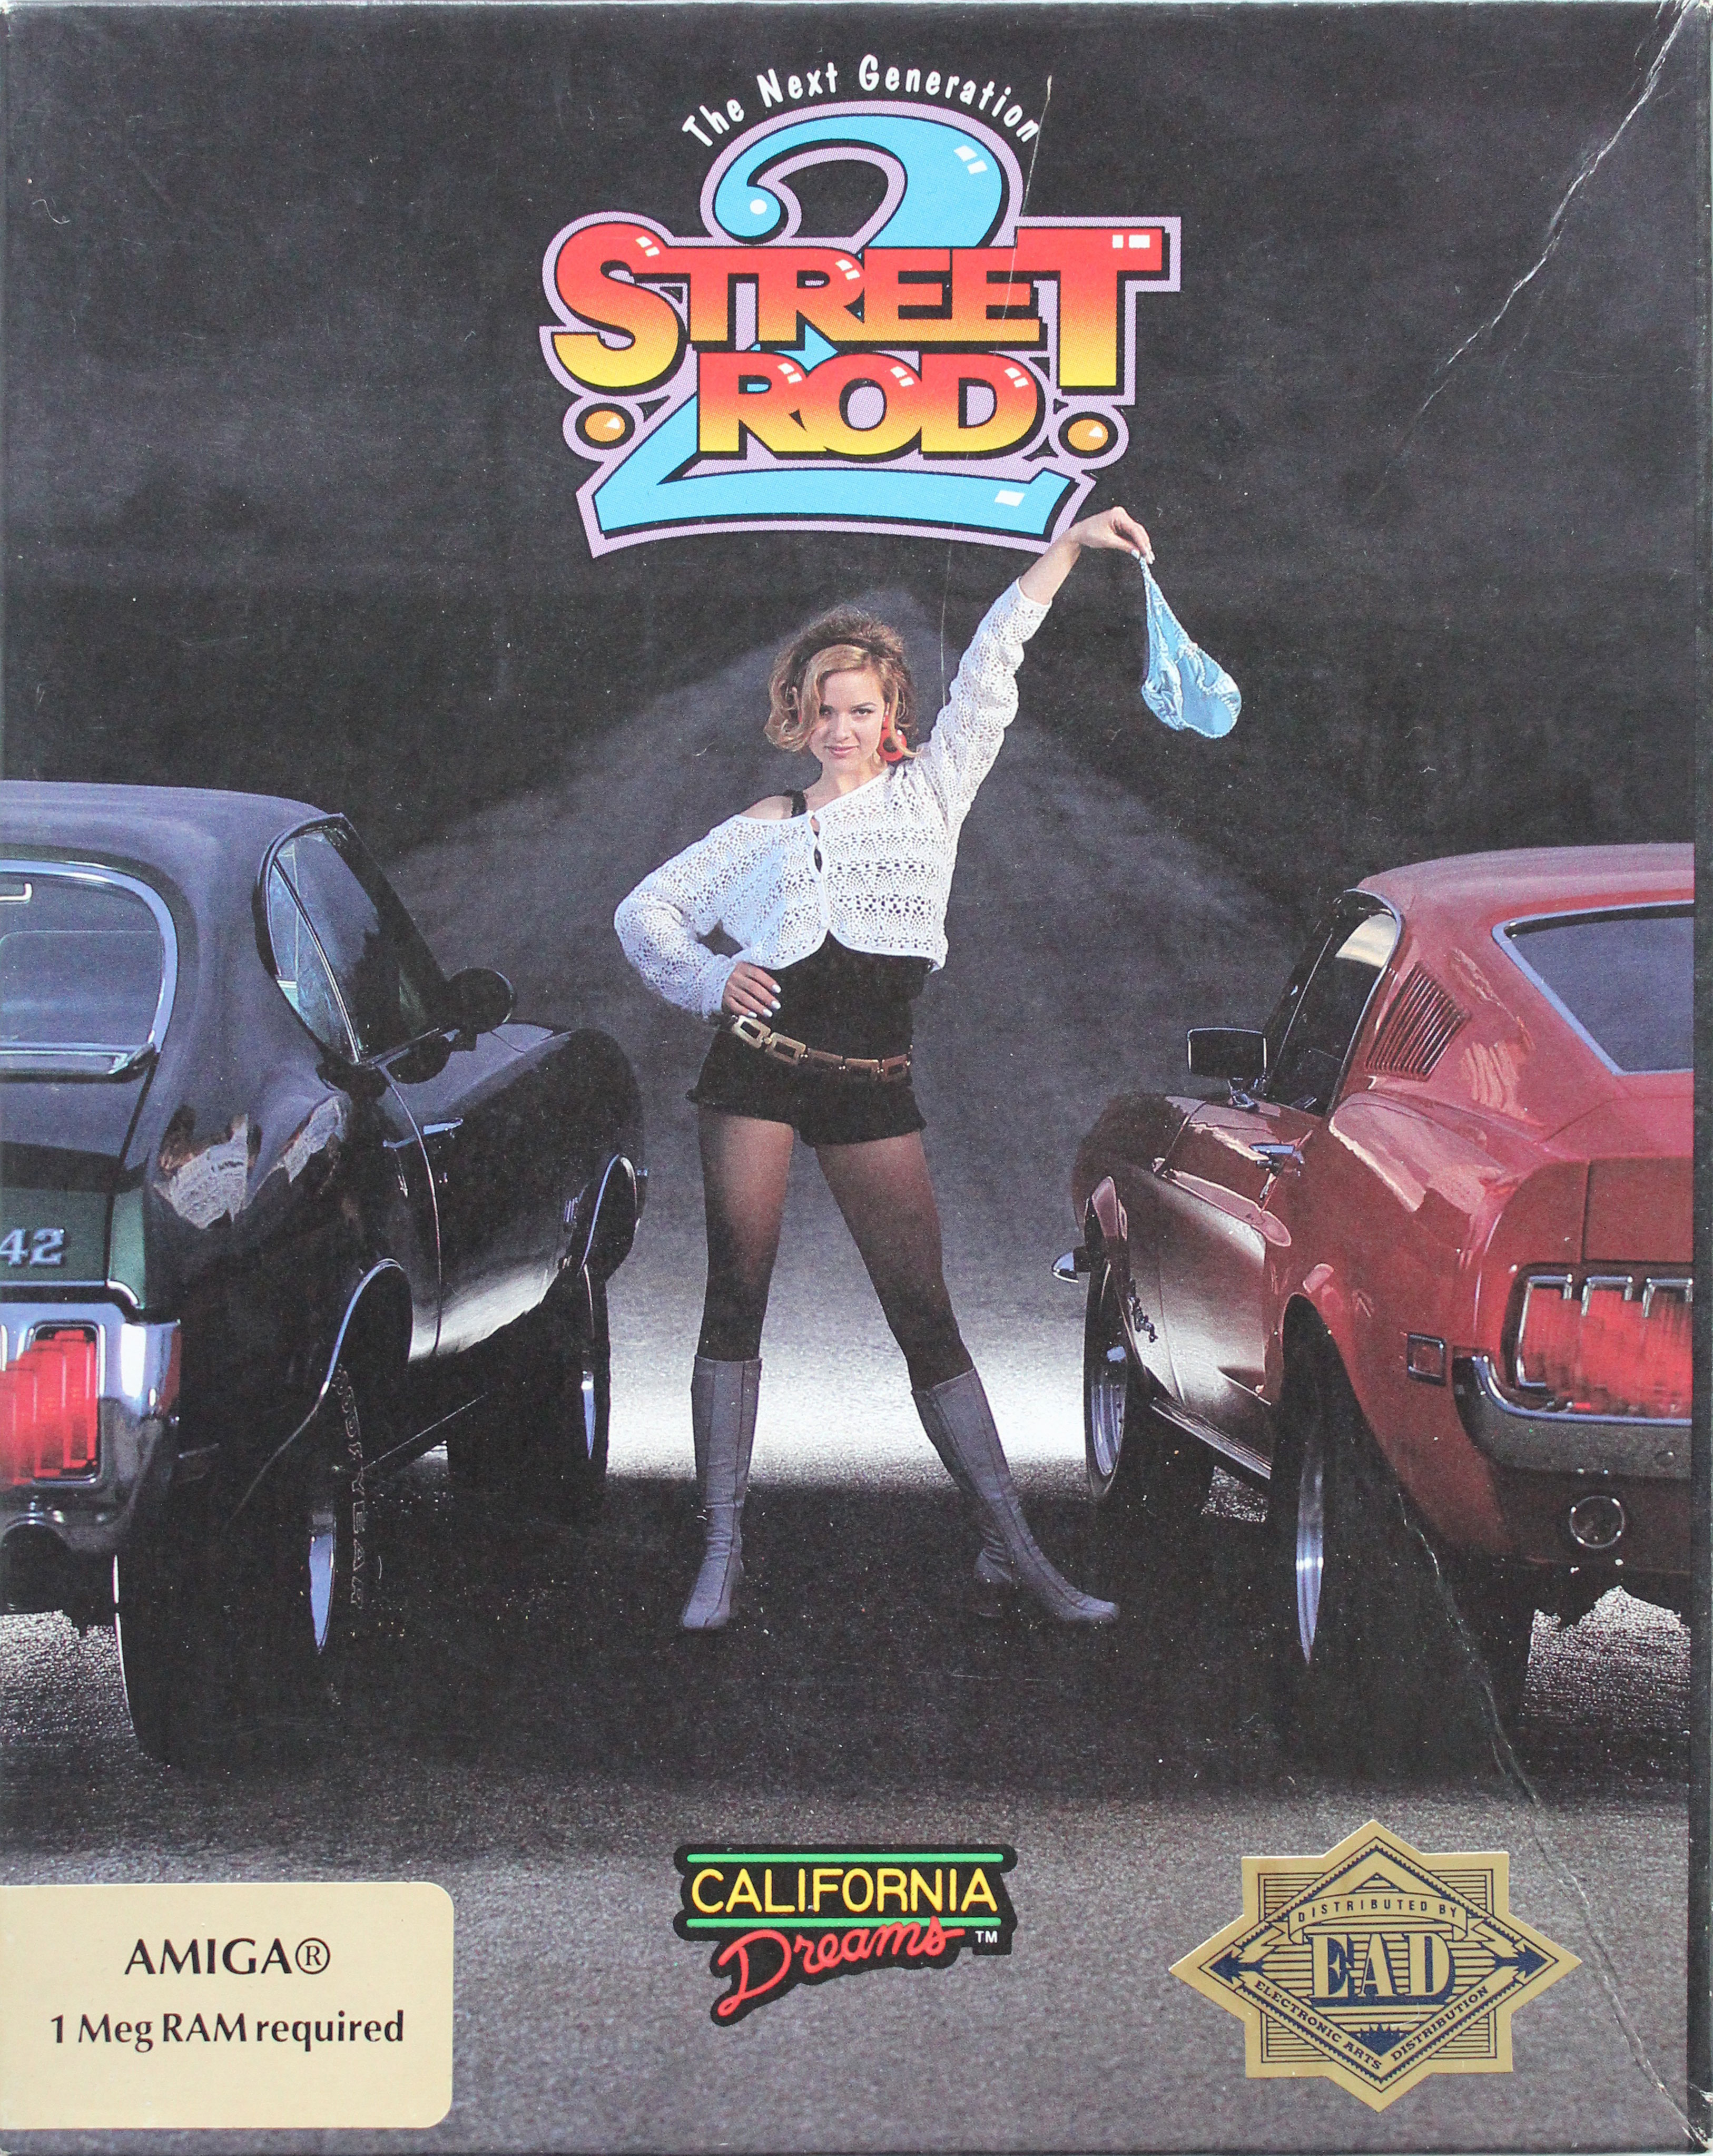 Street Rod 2 for Amiga | Street Rod Online